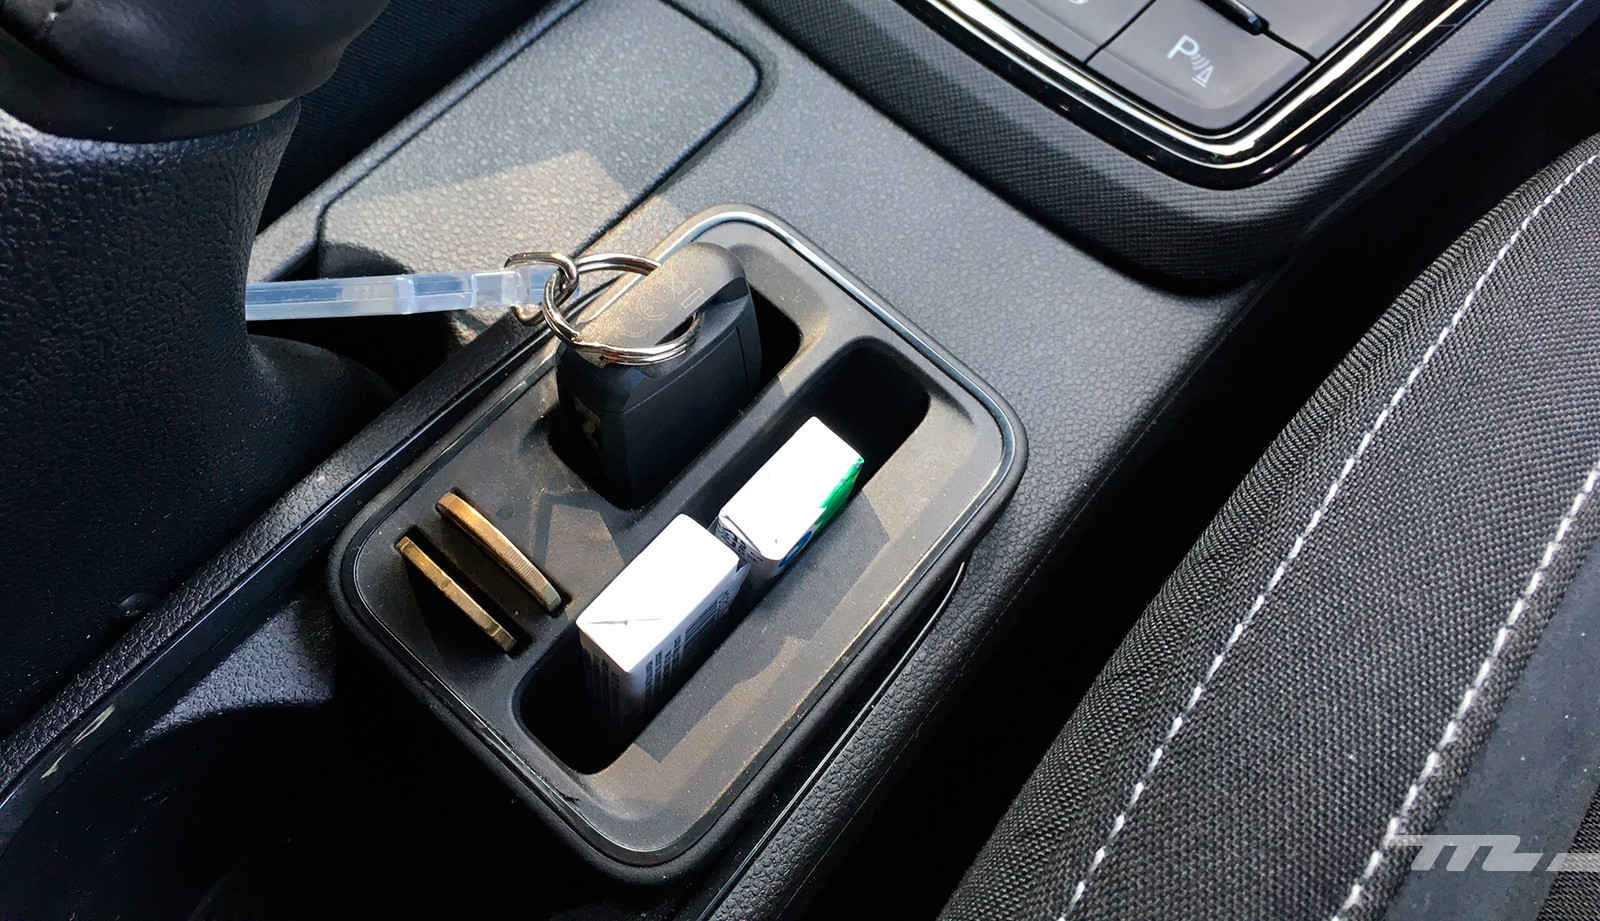 Probamos el Škoda Kamiq 2019